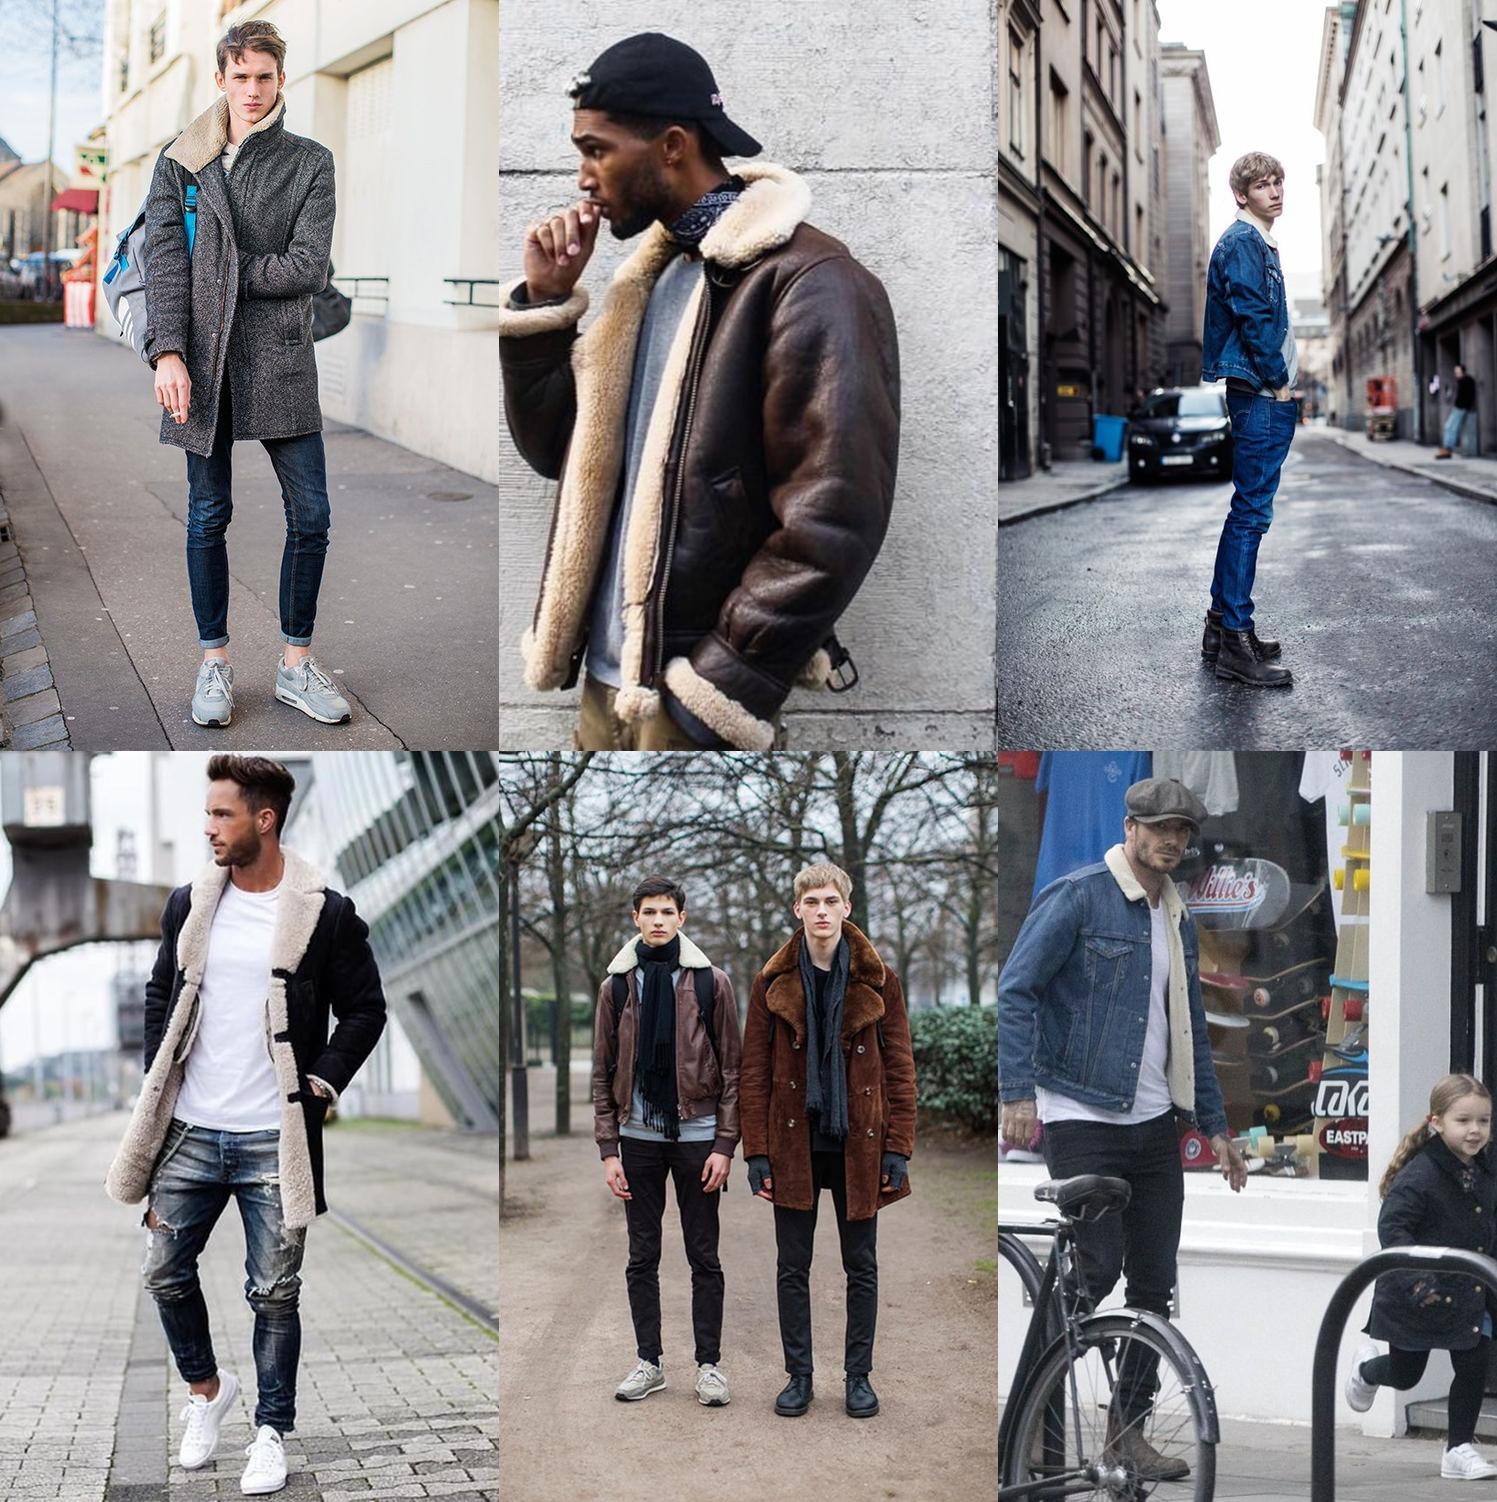 jaqueta pele de carneiro, jaqueta masculina, Sherpa Trucker Jacket. moda masculina, menswear, blogger, blog de moda, alex cursino, moda sem censura, dicas de moda, 3